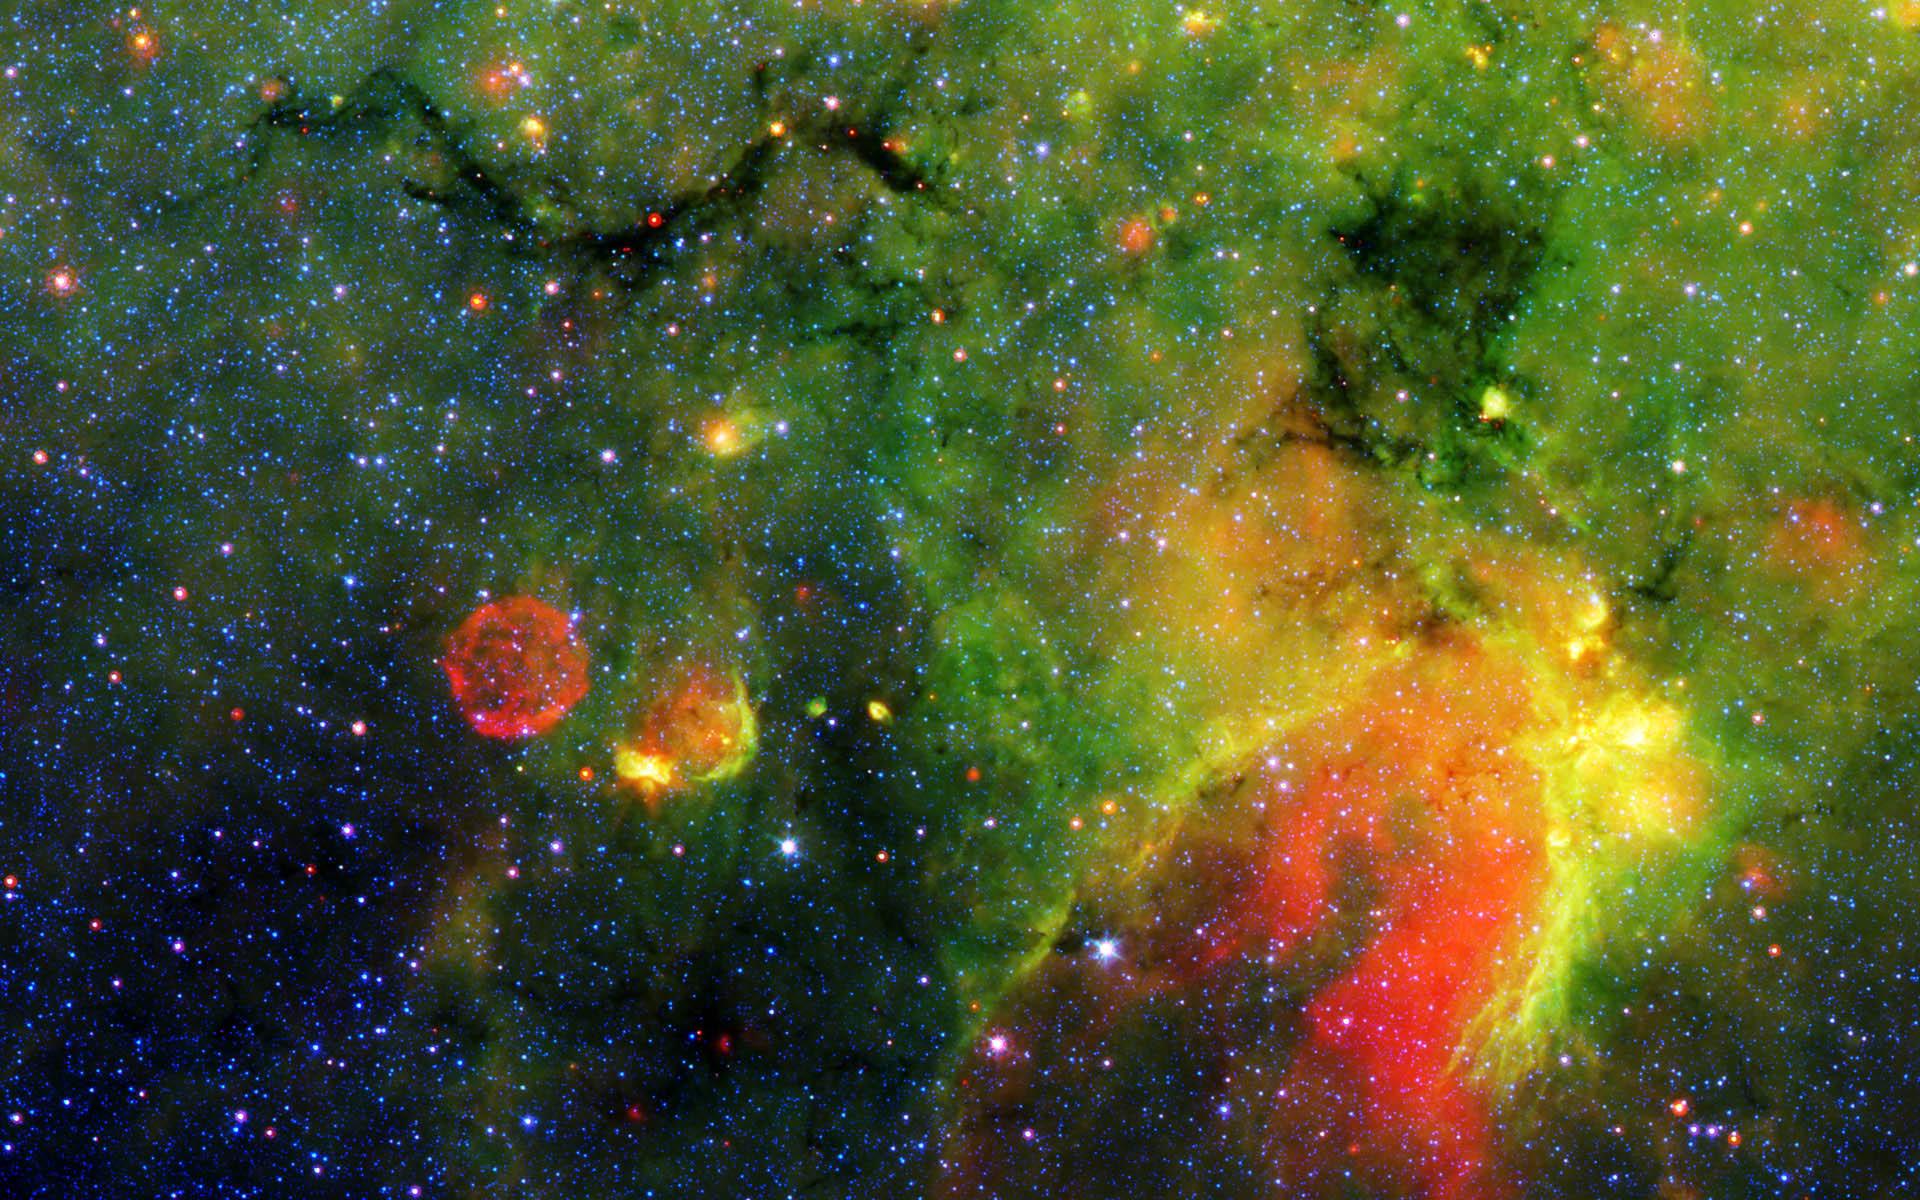 http://img1.goodfon.ru/original/1920x1200/7/9e/kosmos-tumannost-gaz-zelenoe.jpg